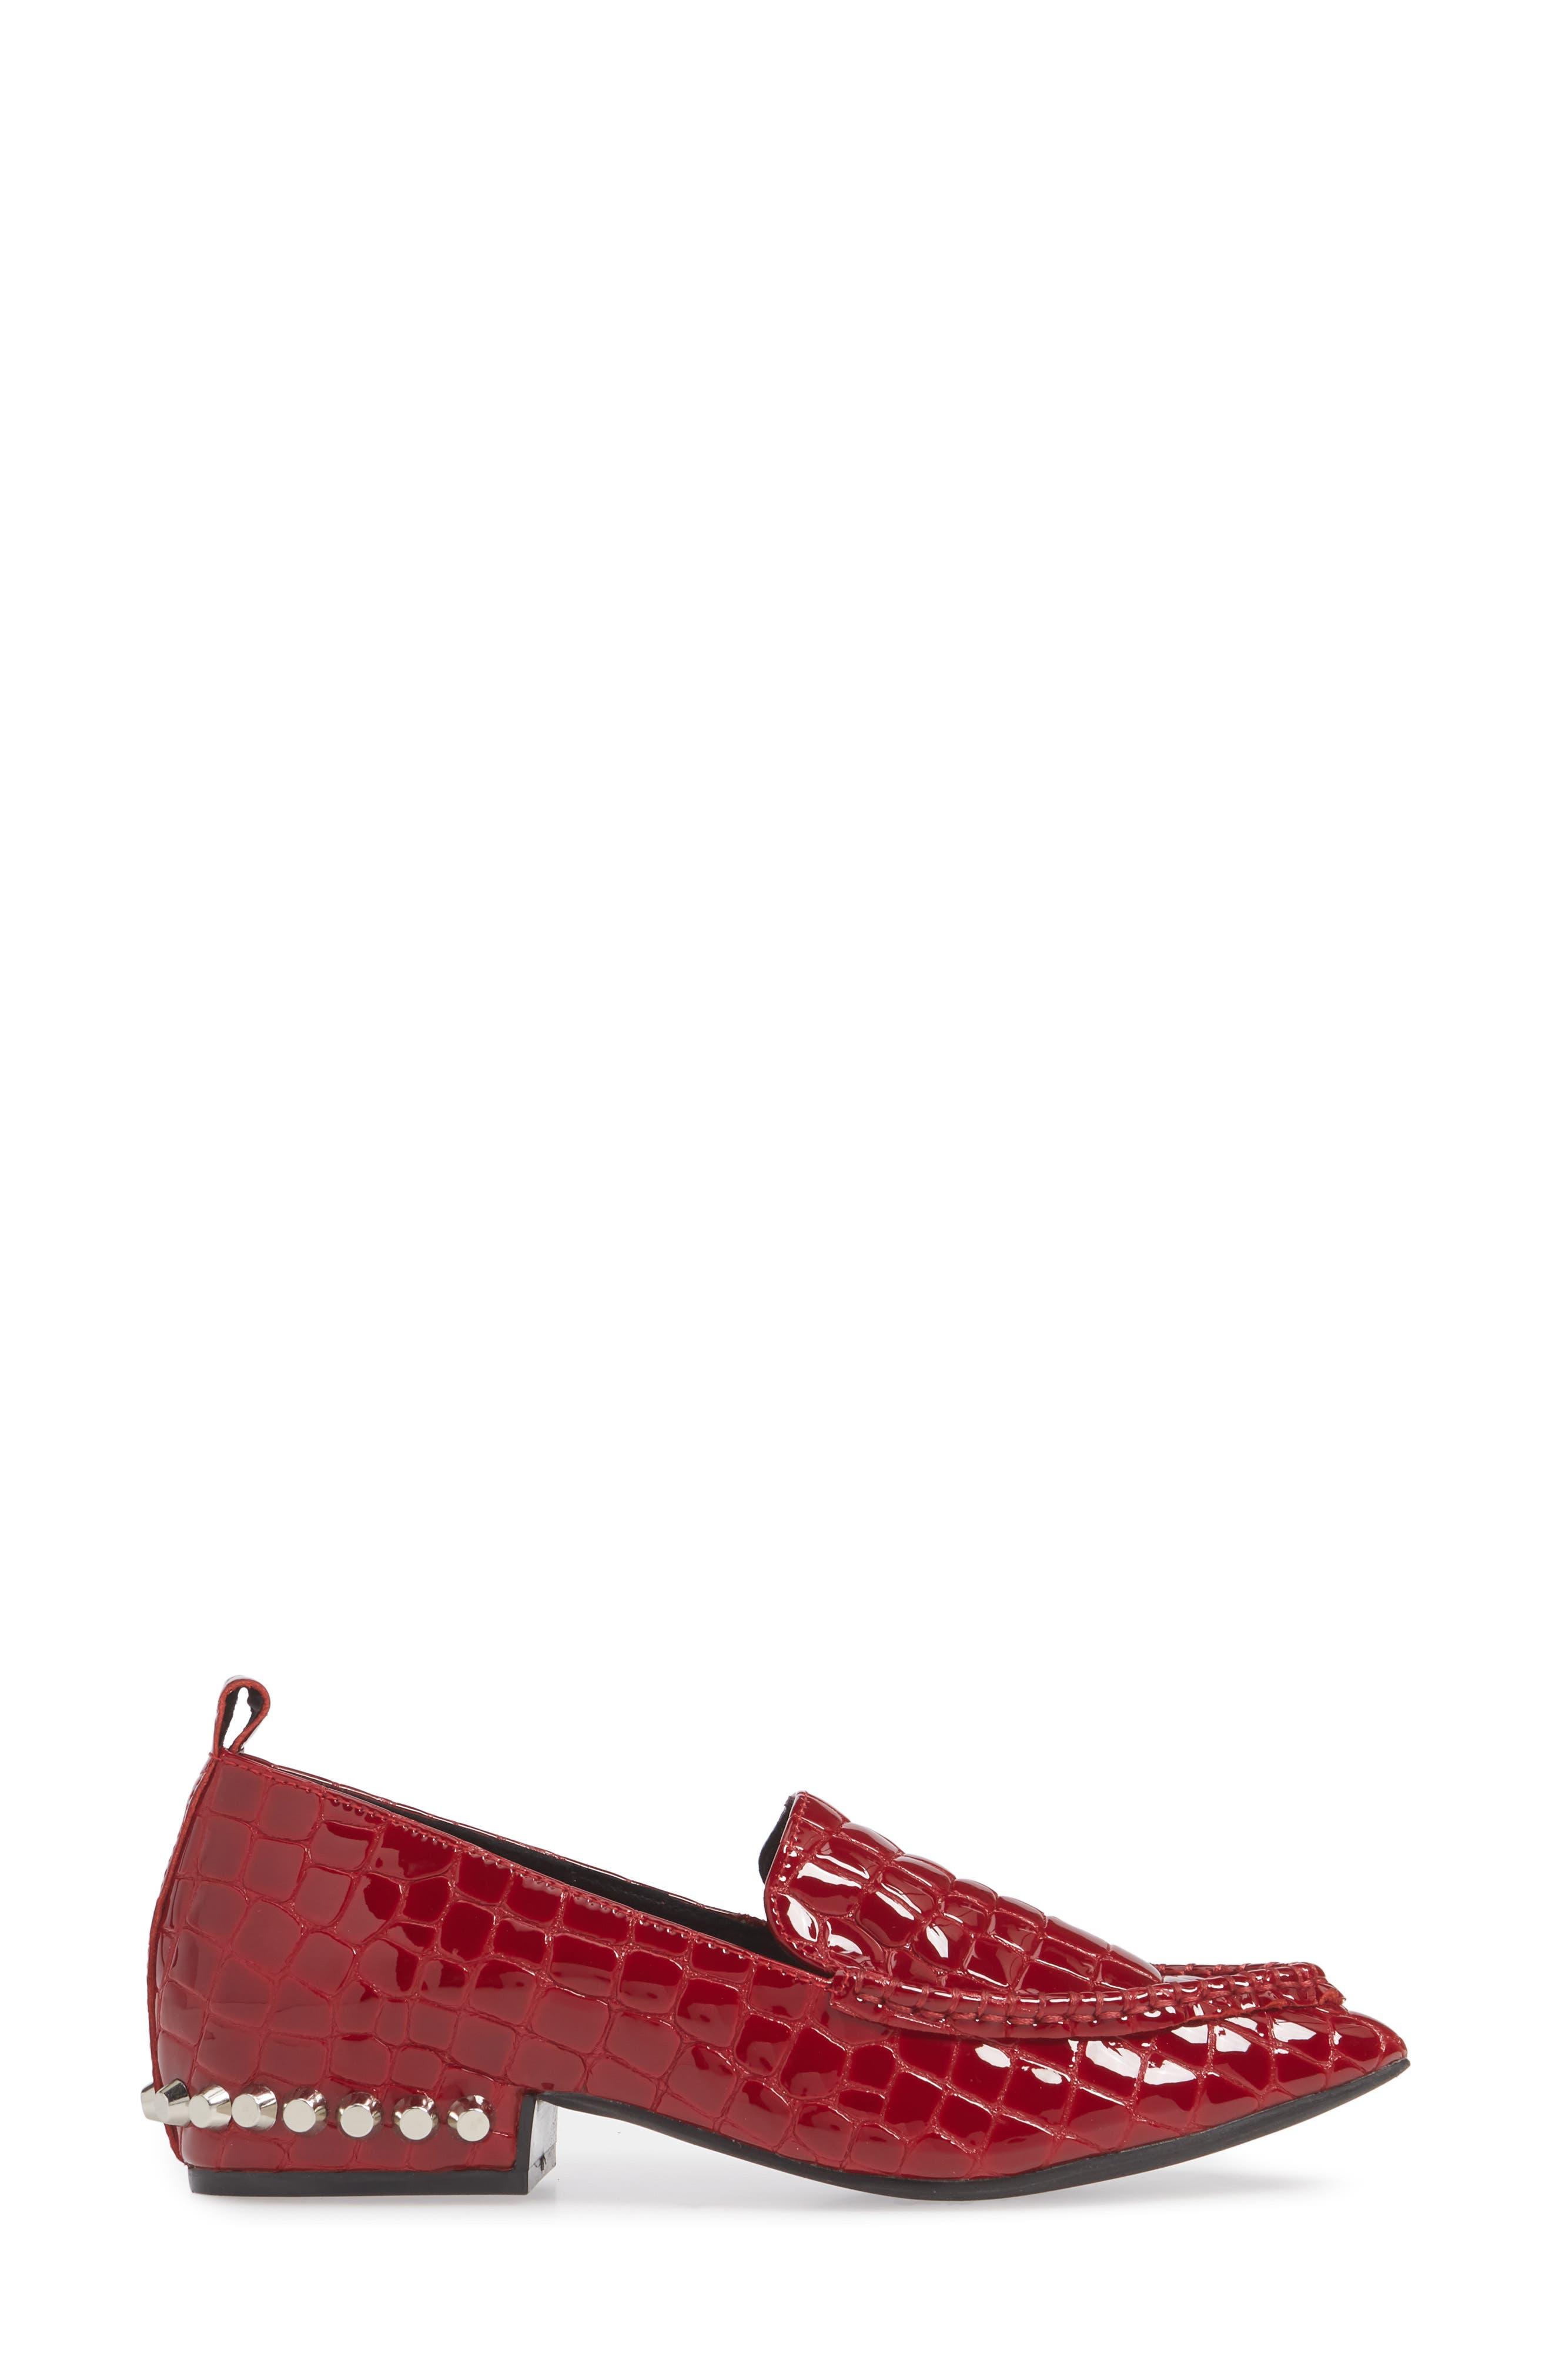 JEFFREY CAMPBELL, Barnett Studded Loafer, Alternate thumbnail 3, color, RED CROCODILE PRINT LEATHER